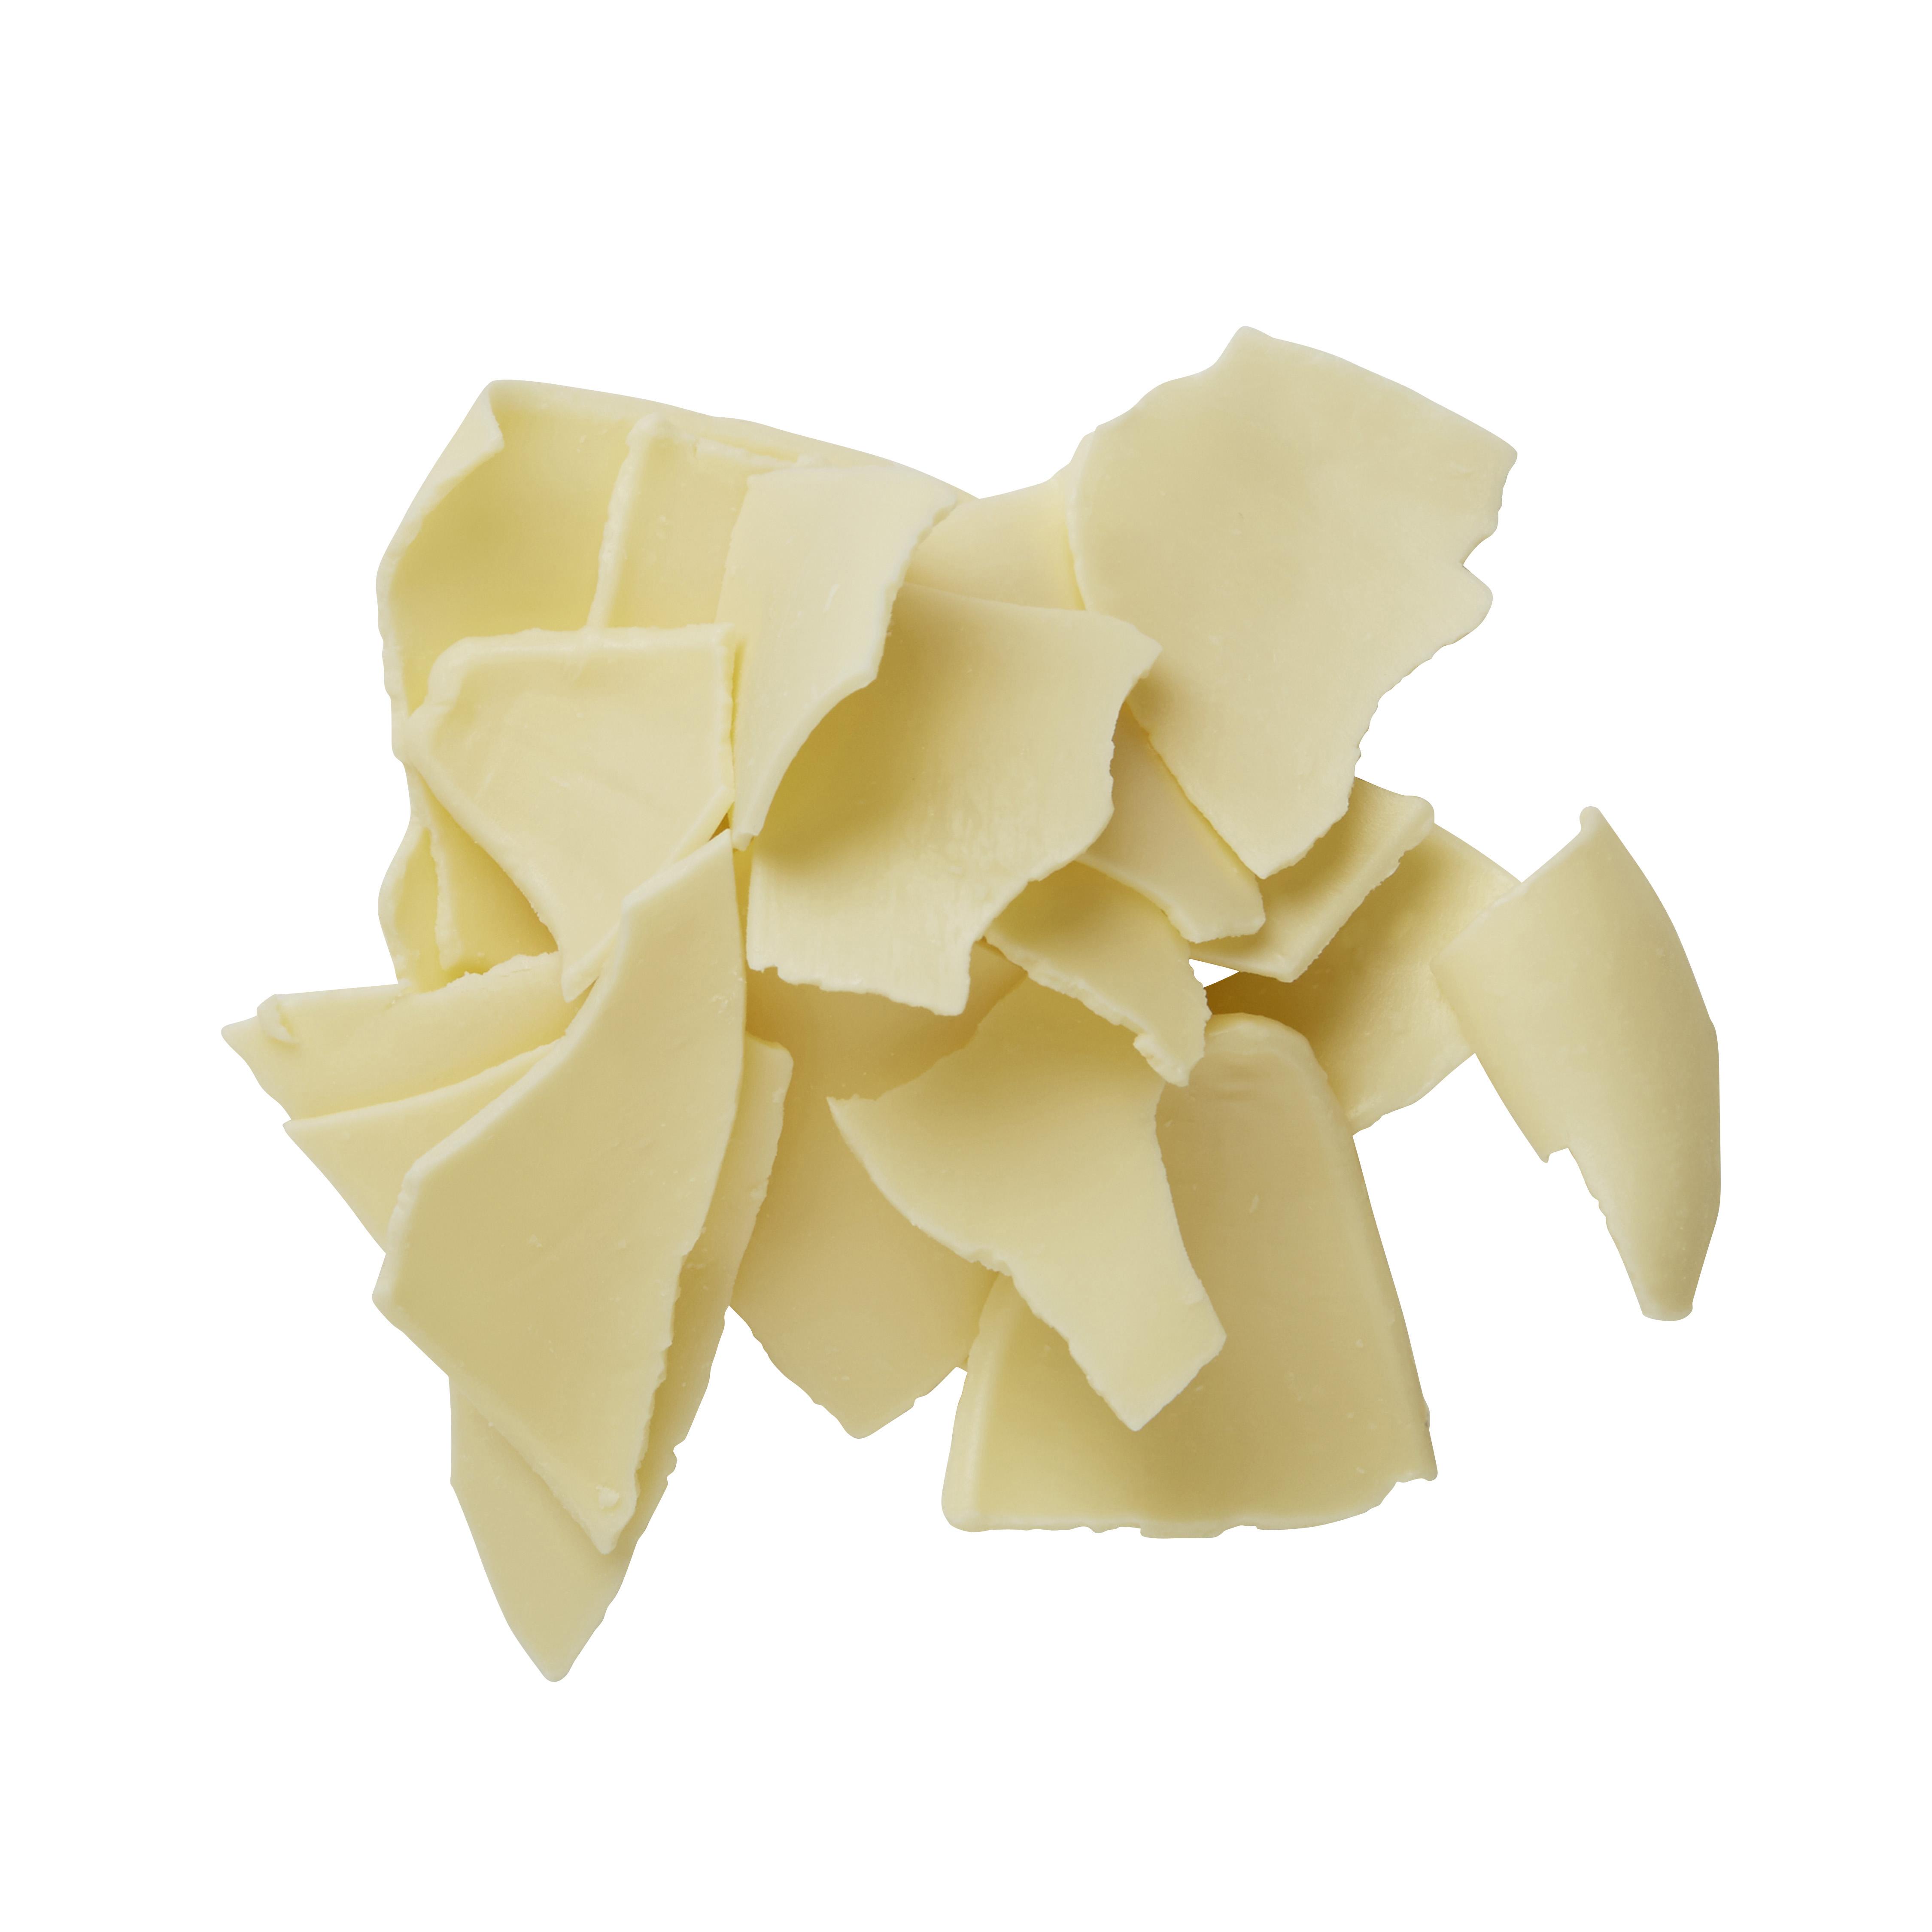 Shavings - Ivory Flakes